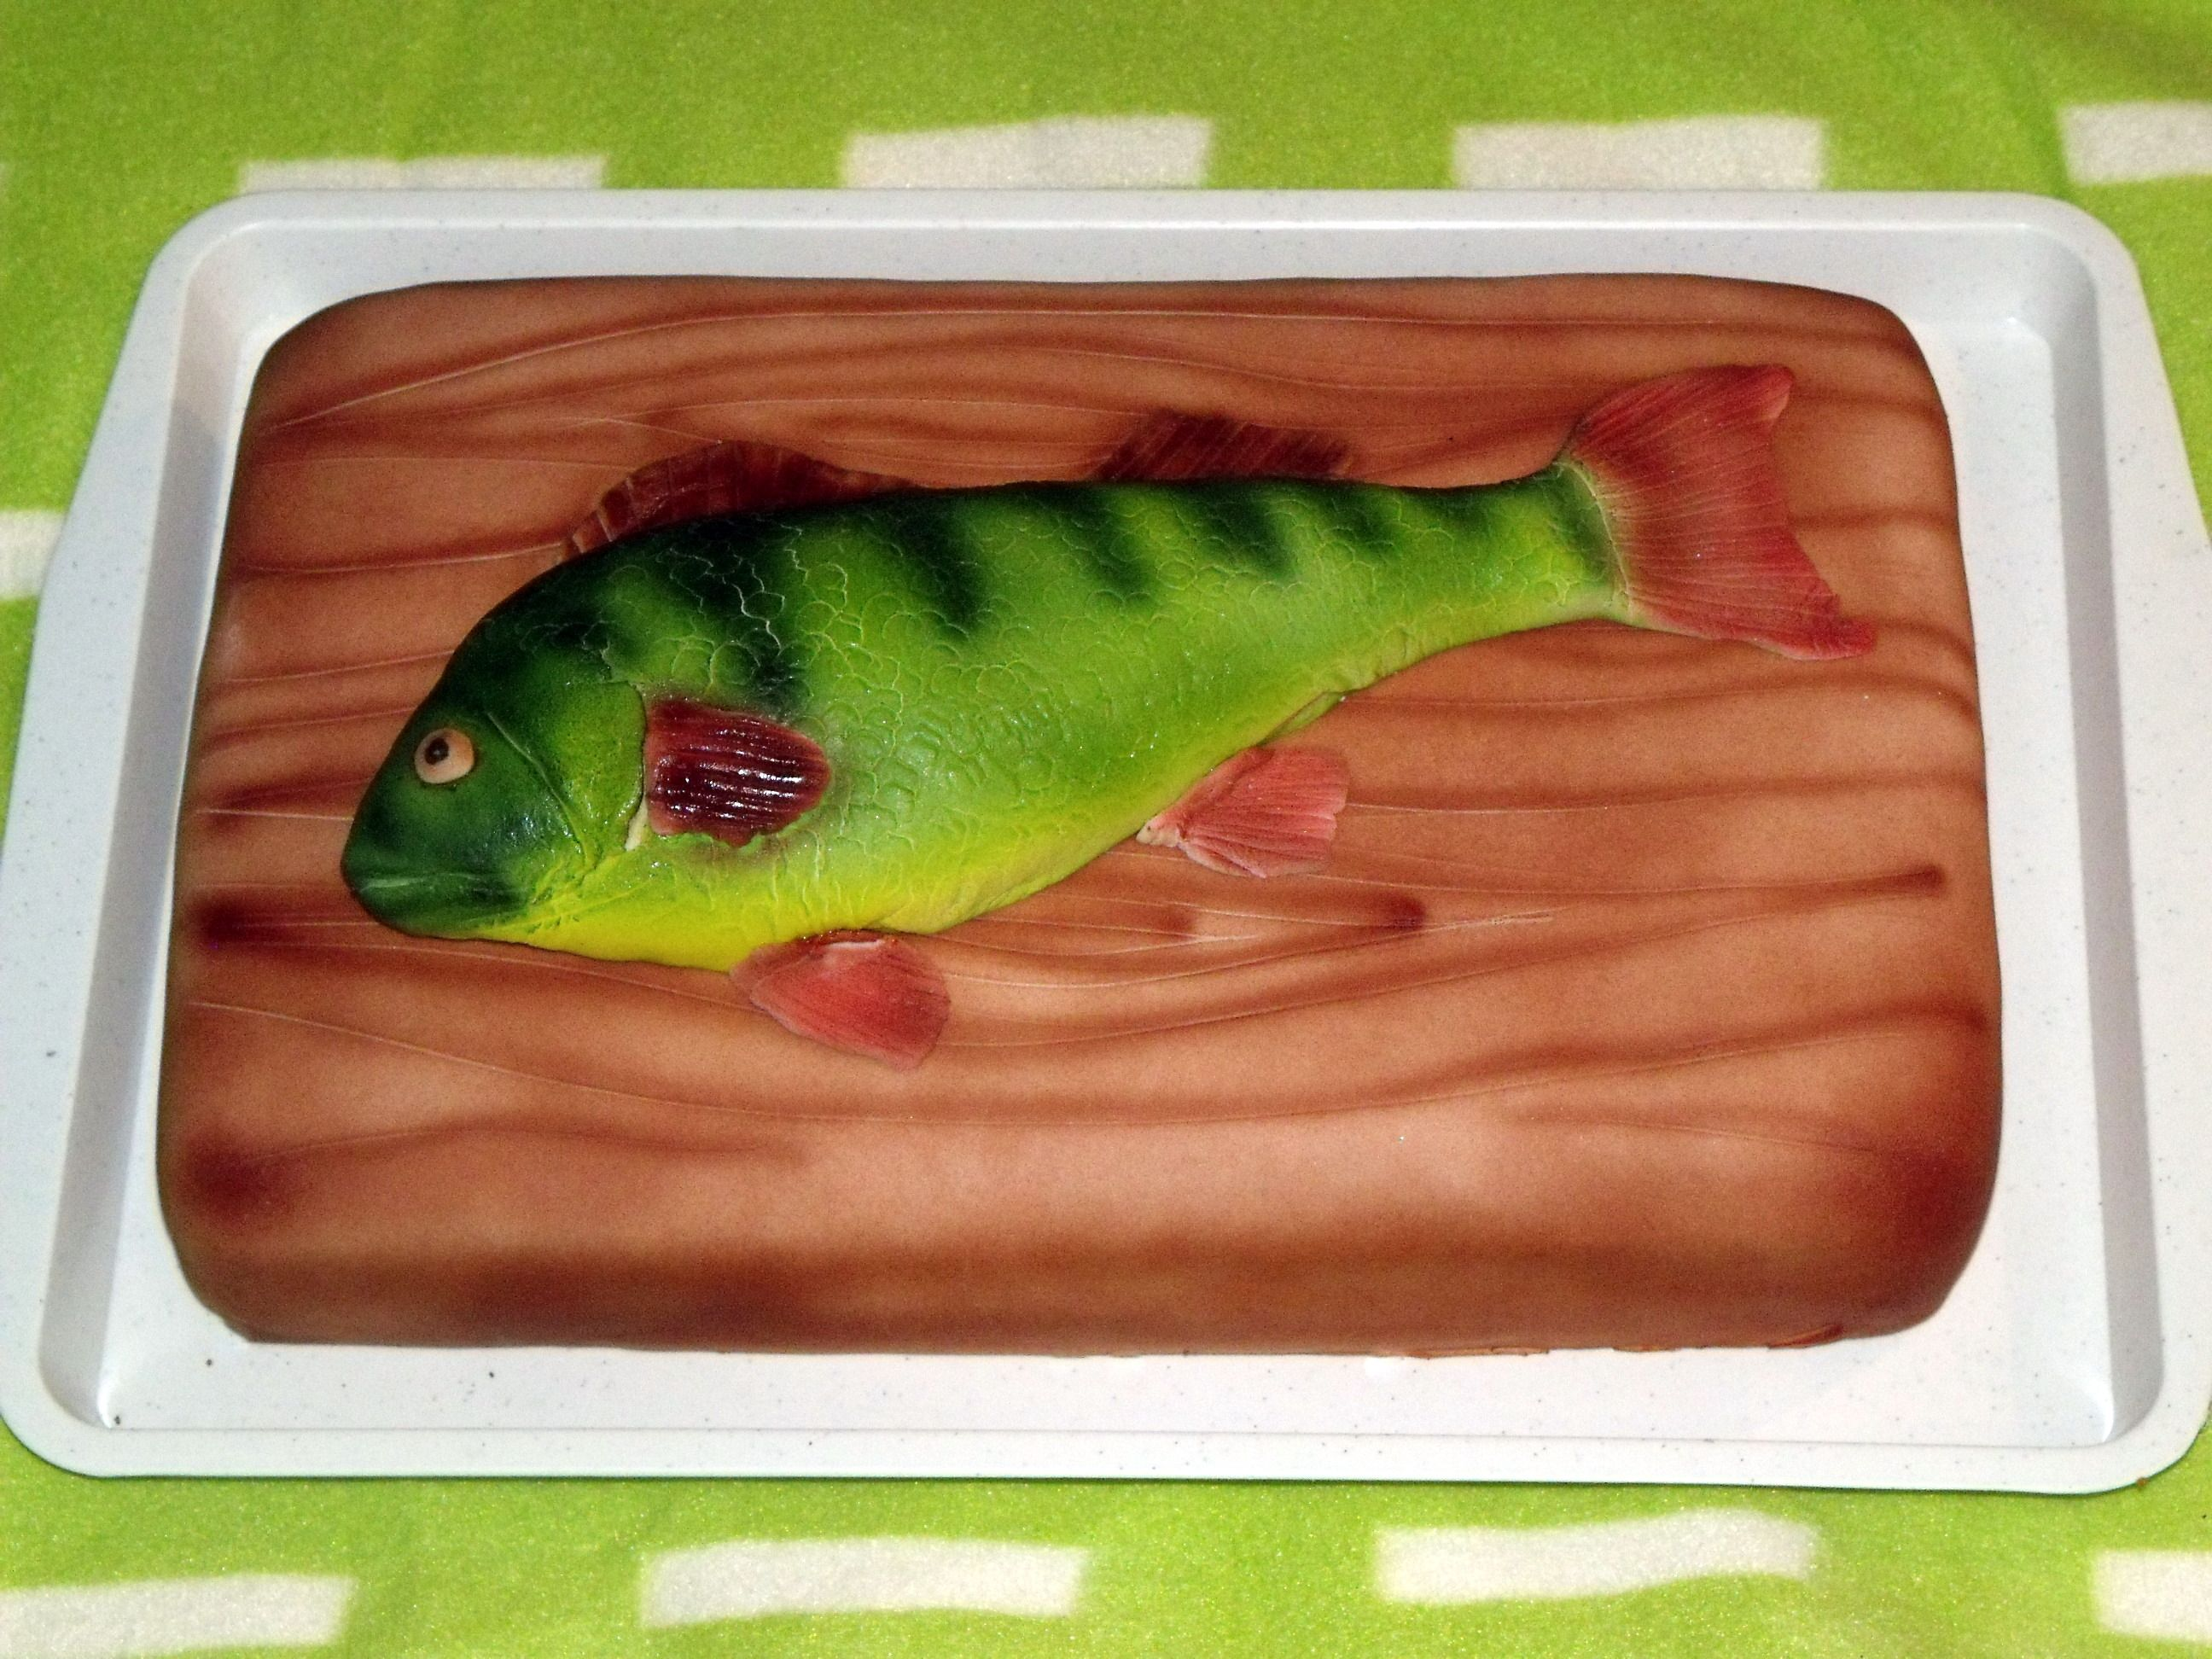 halas torták képek Halas torta | Tortáim | Pinterest halas torták képek